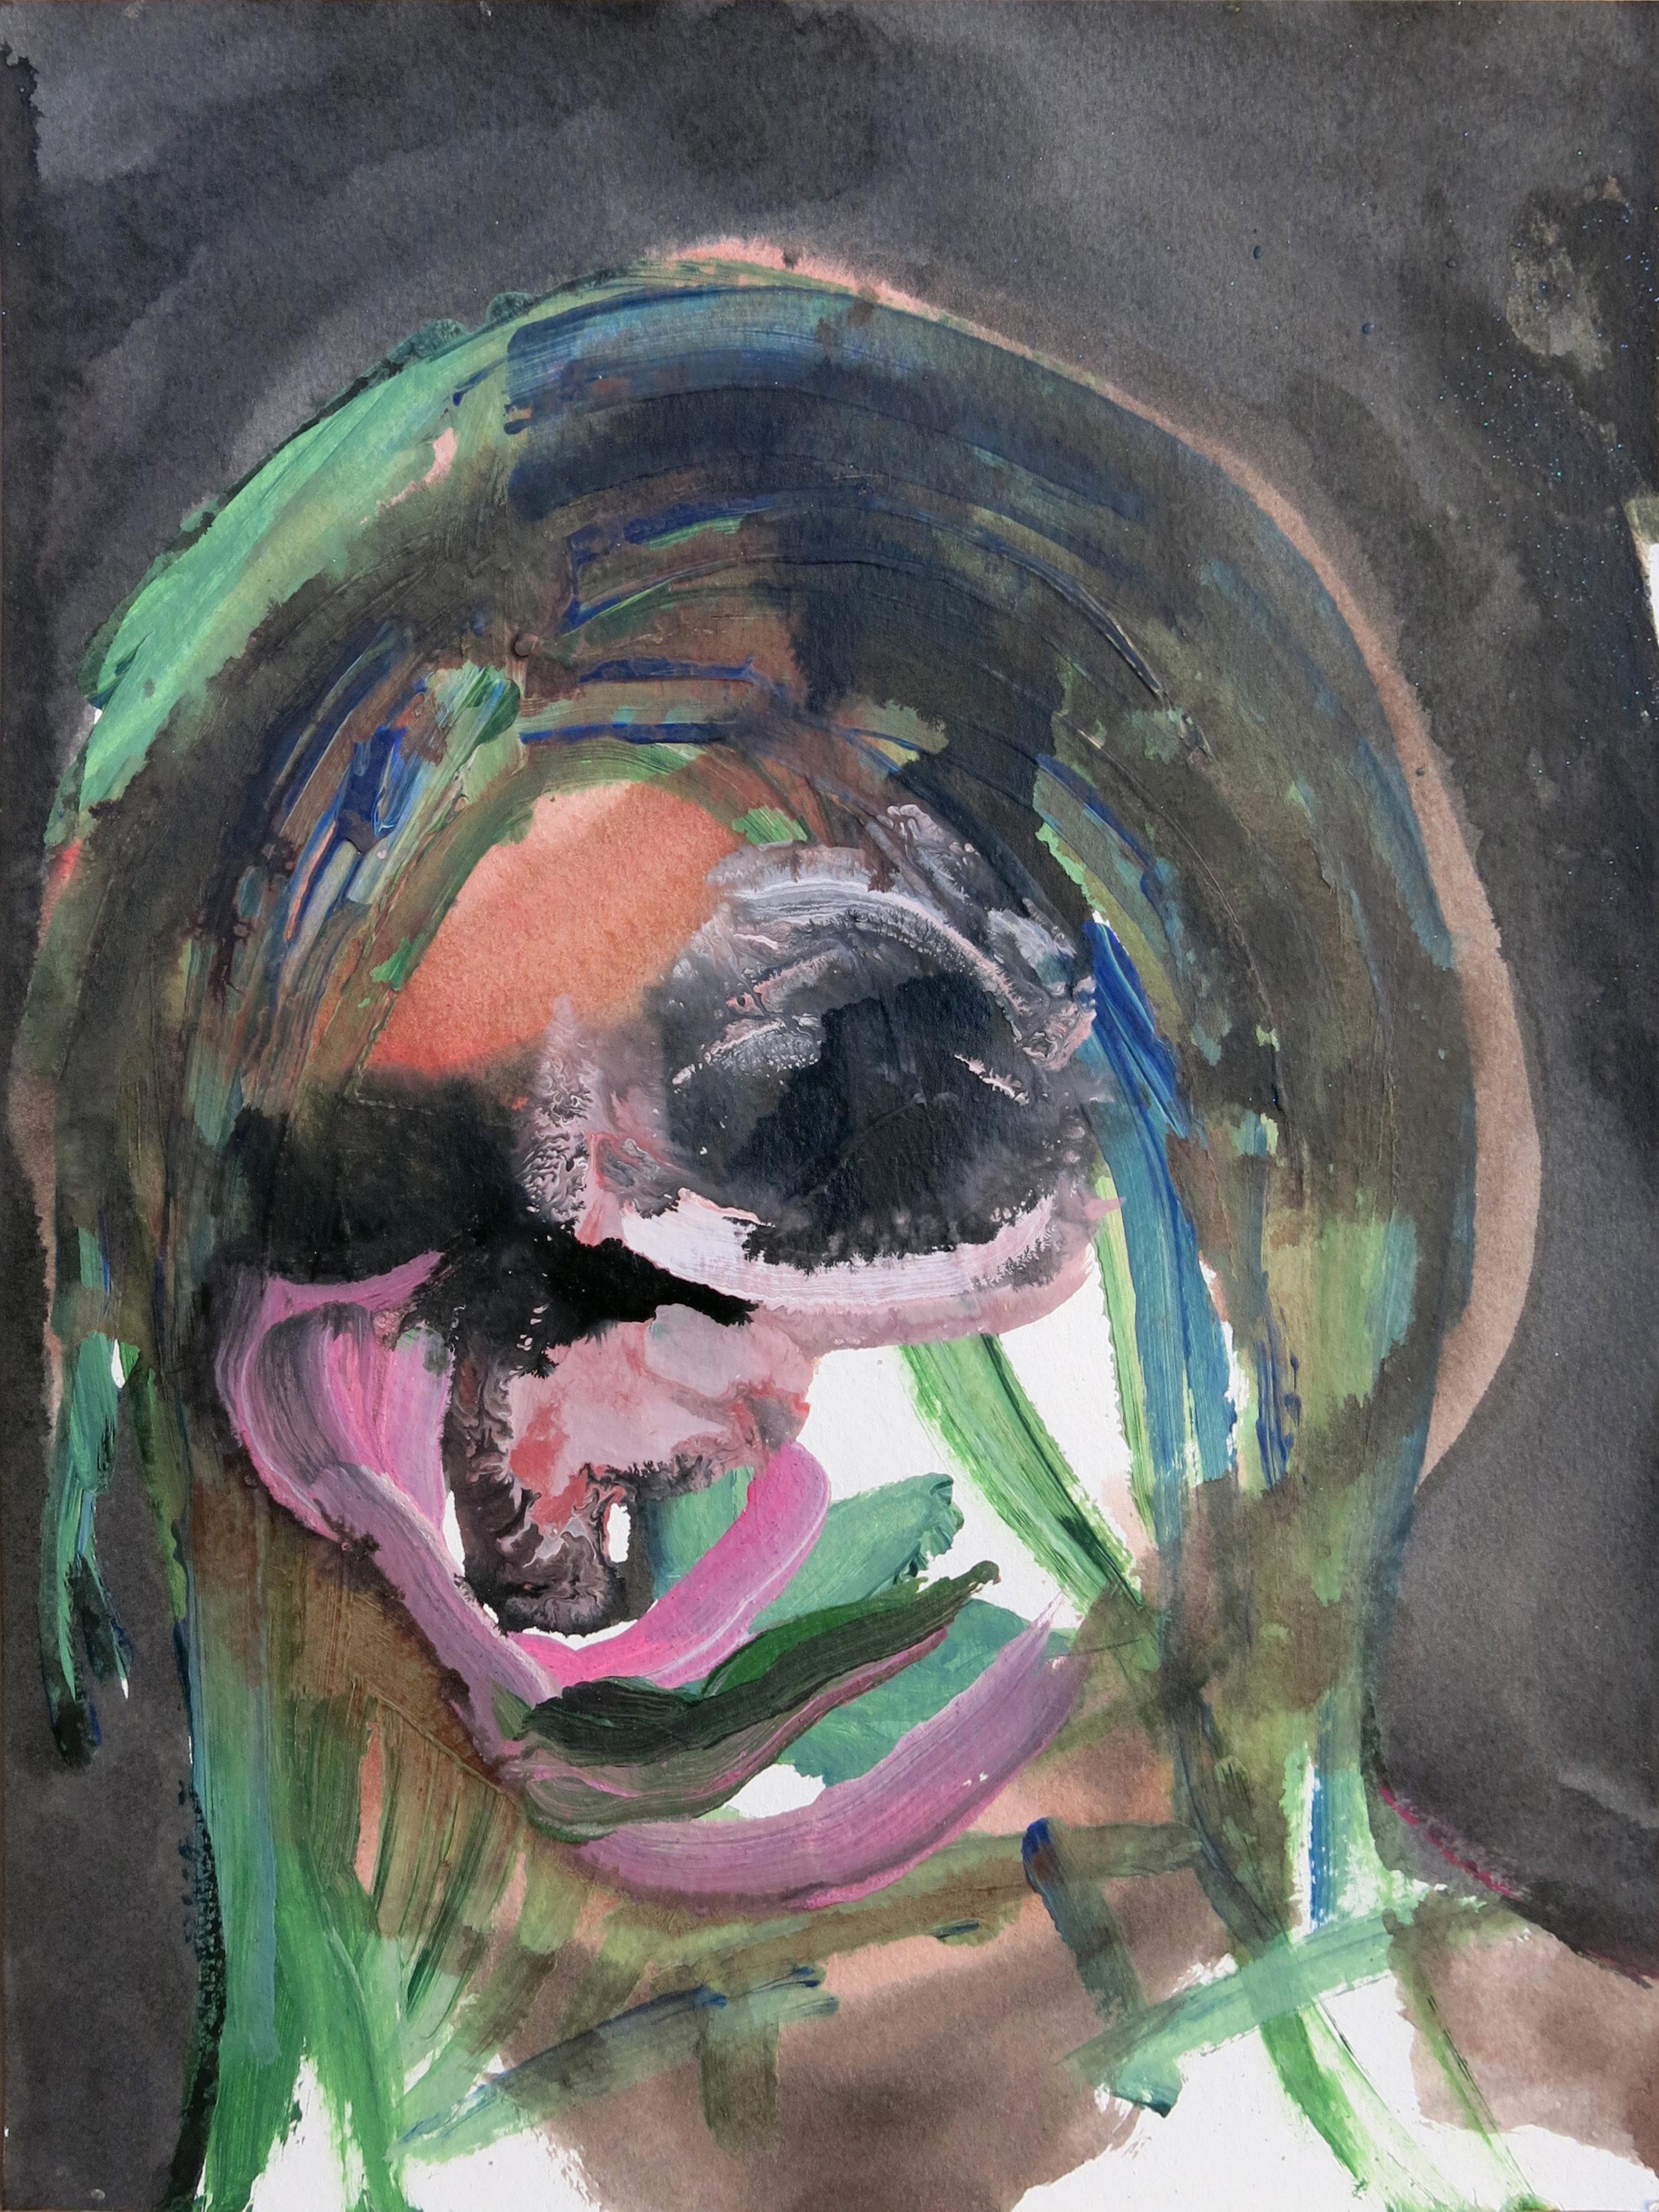 Barbra Streisand Portrait #63